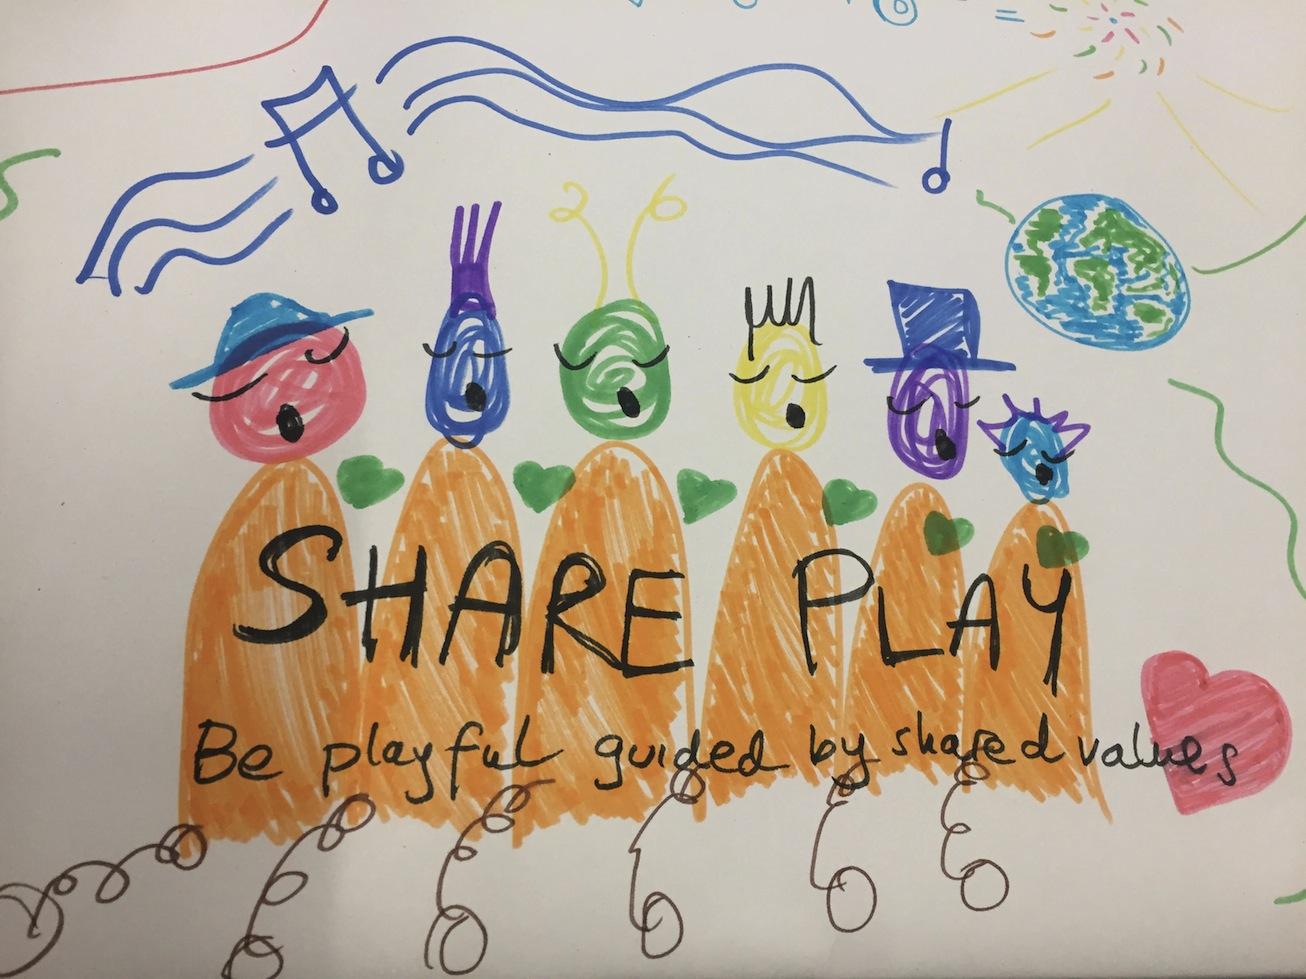 Share-Play